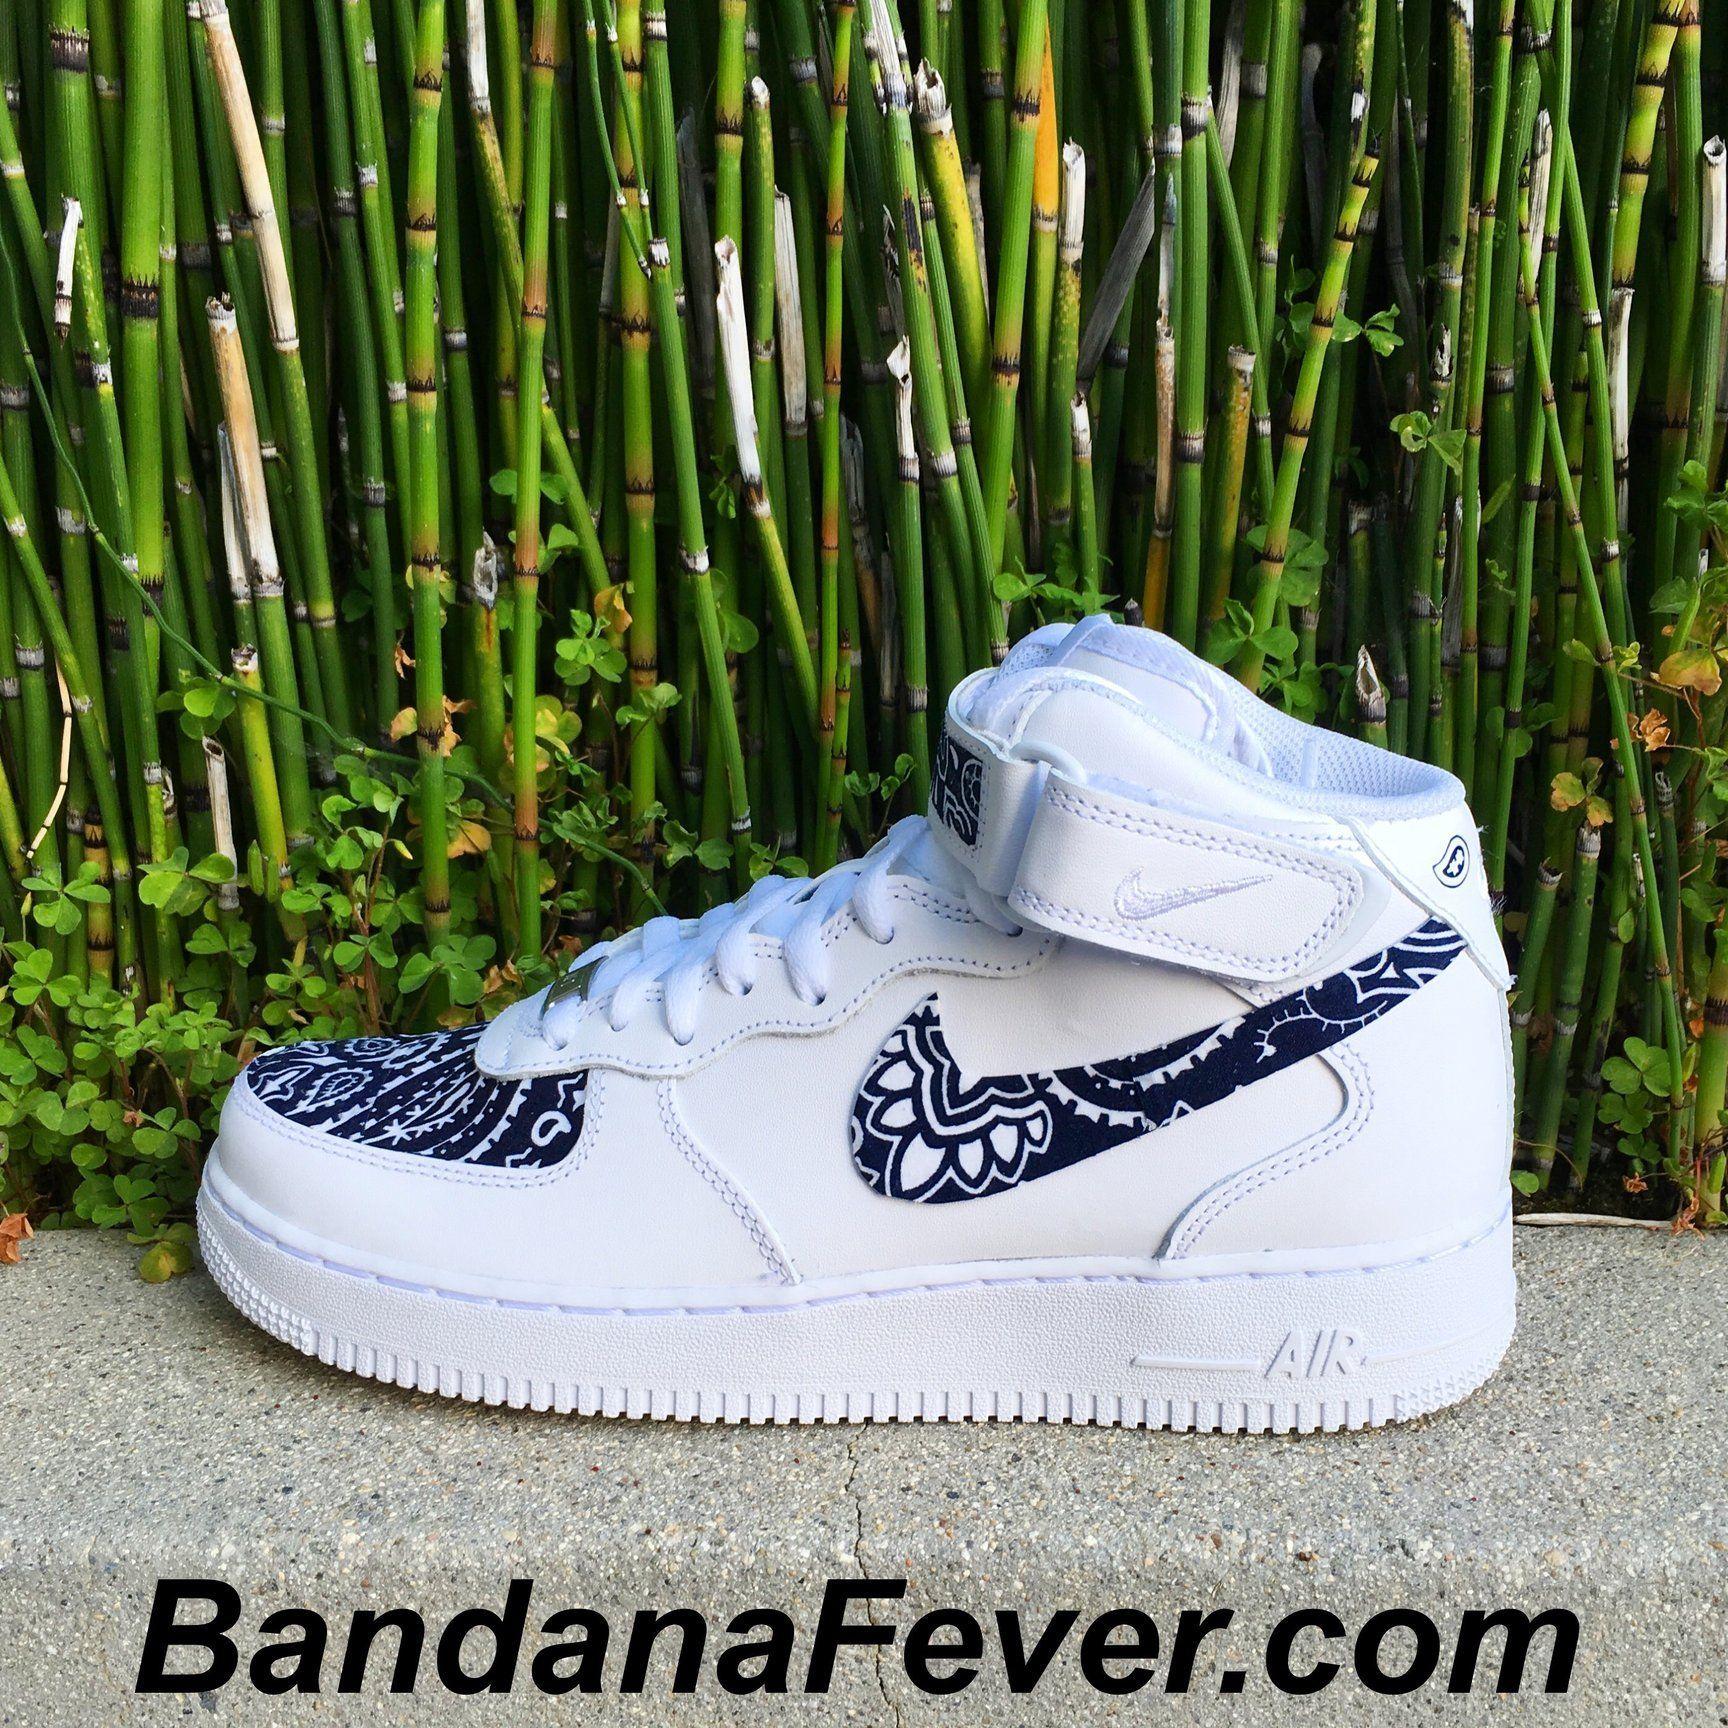 Buy Custom Nike Air Force 1 Shoes, Custom Nike Air Max 90